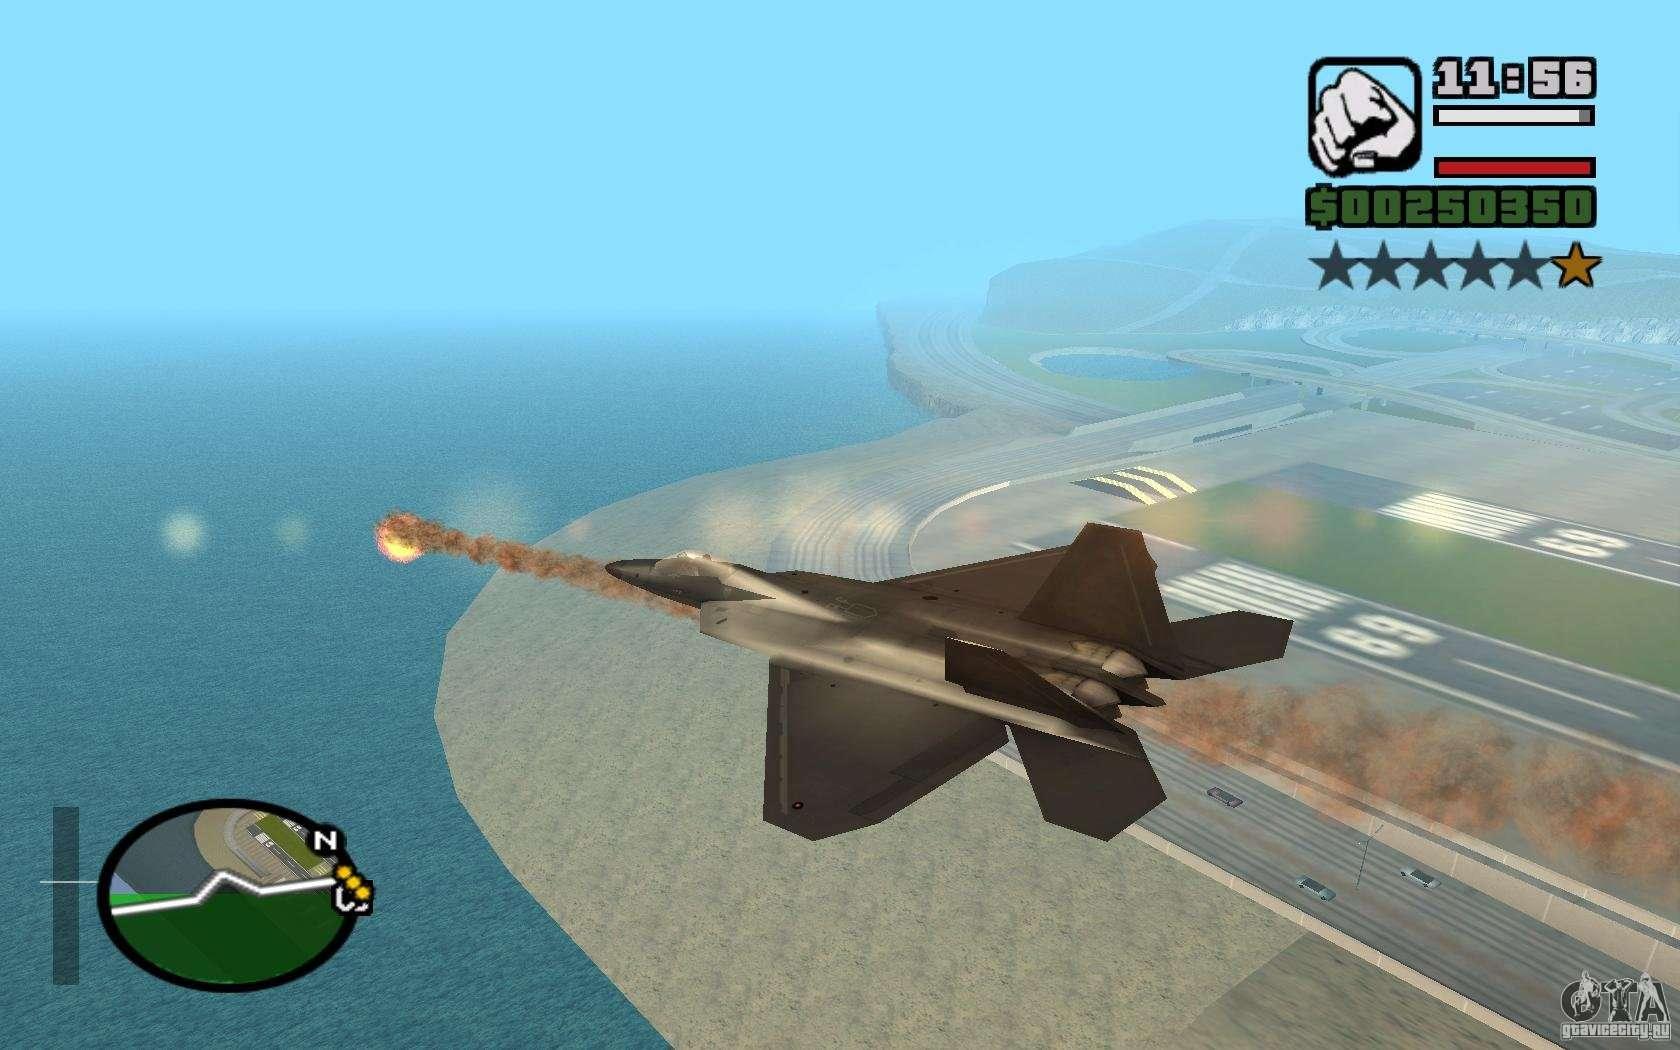 Hydra, Panzer mod for GTA San Andreas Gta San Andreas Cool Mods